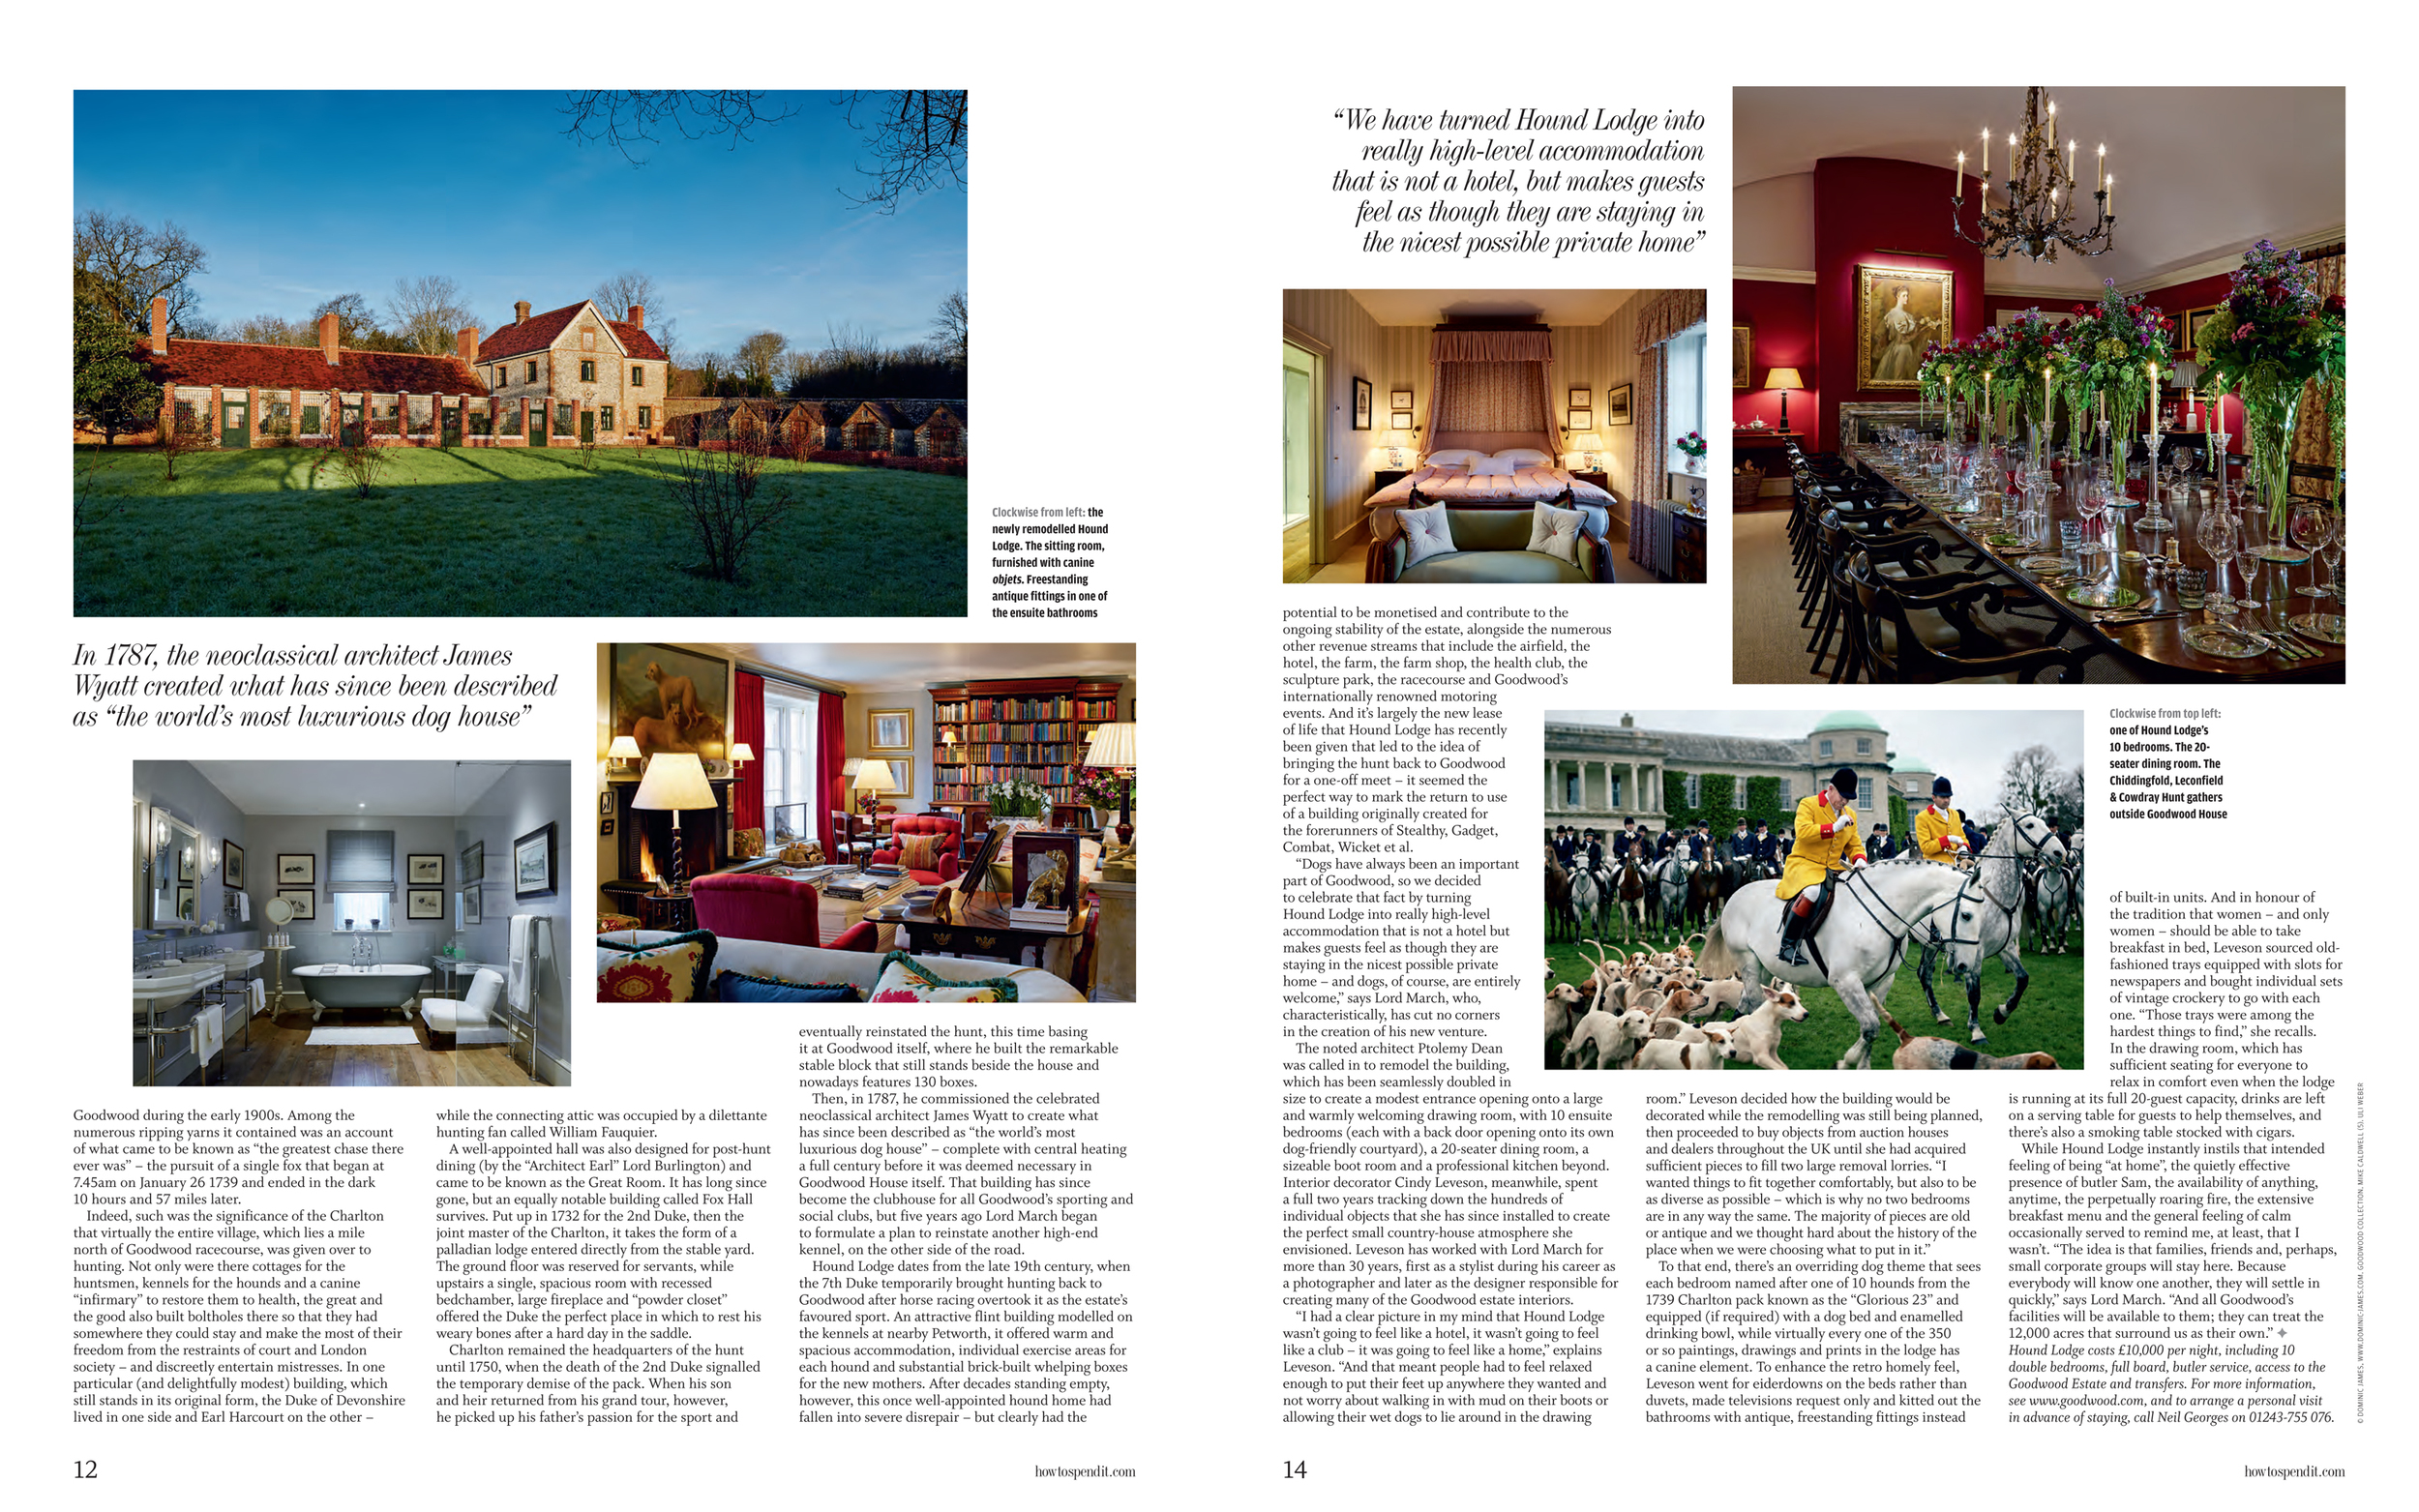 PAGE 2HowToSpendIt - CharltonHunt Article-2.jpg